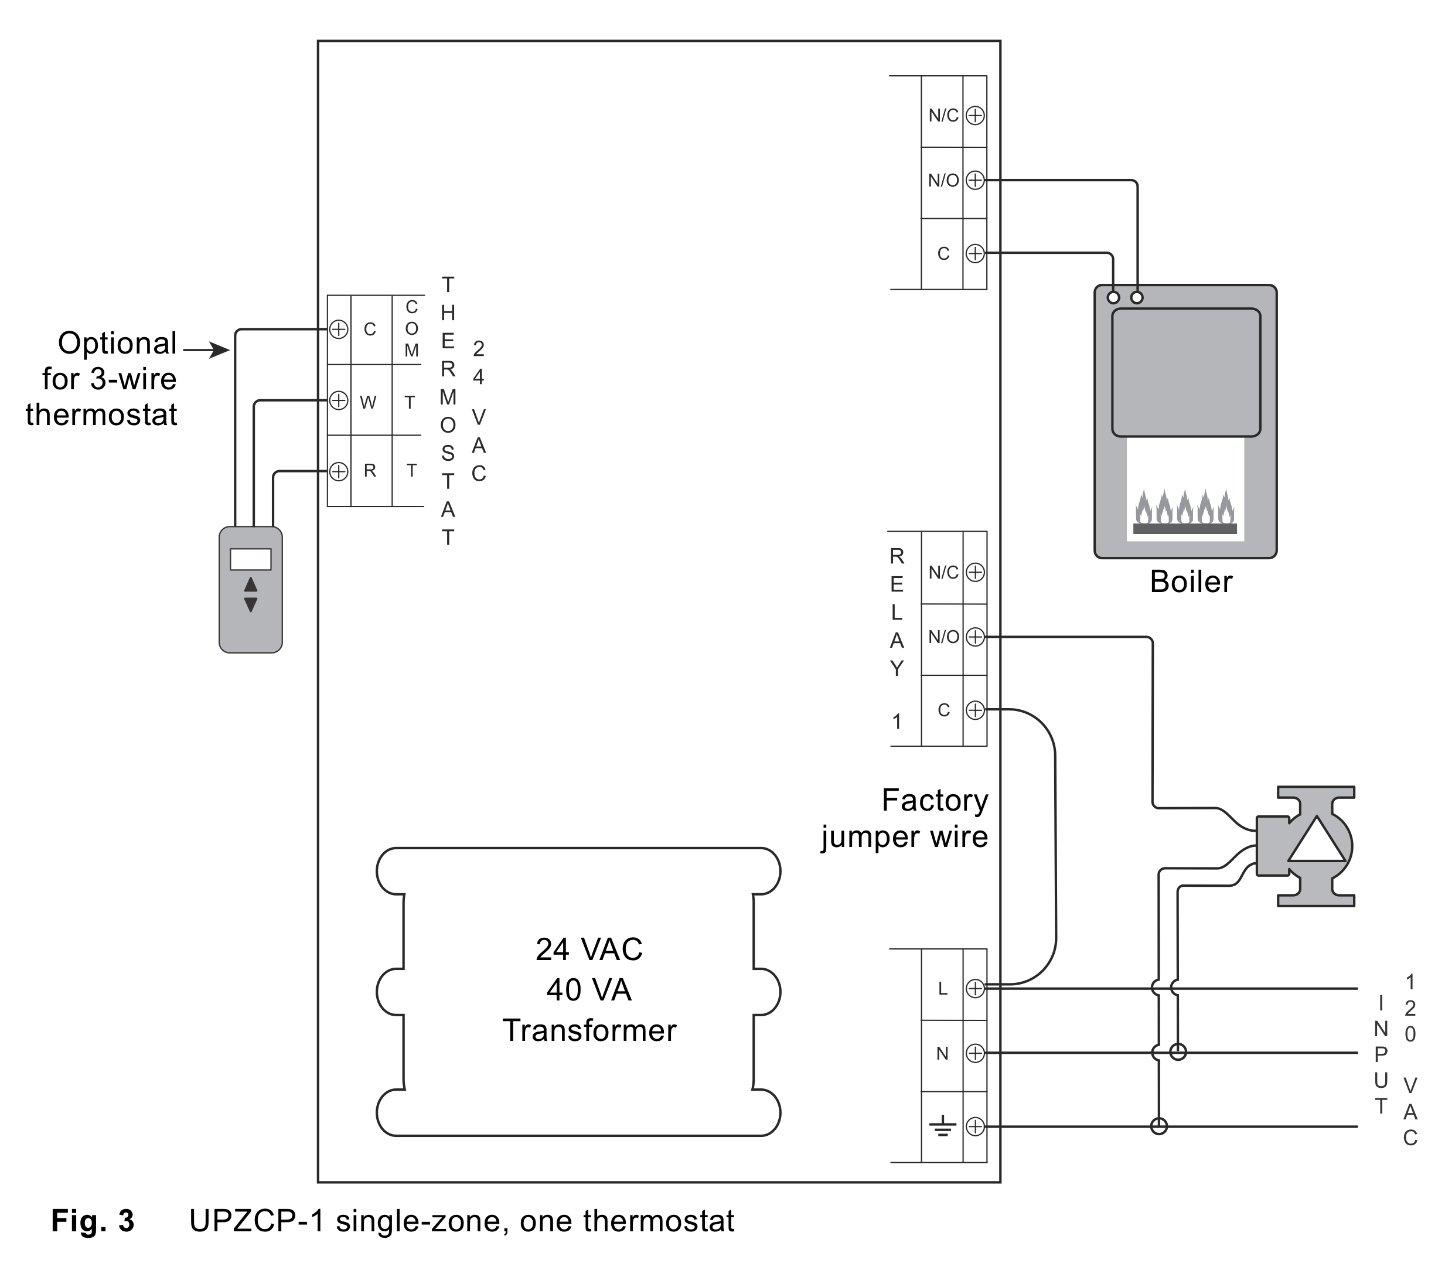 Wy 2476 Zone Valve Wiring Diagram Likewise White Rodgers Zone Valve Wiring Free Diagram